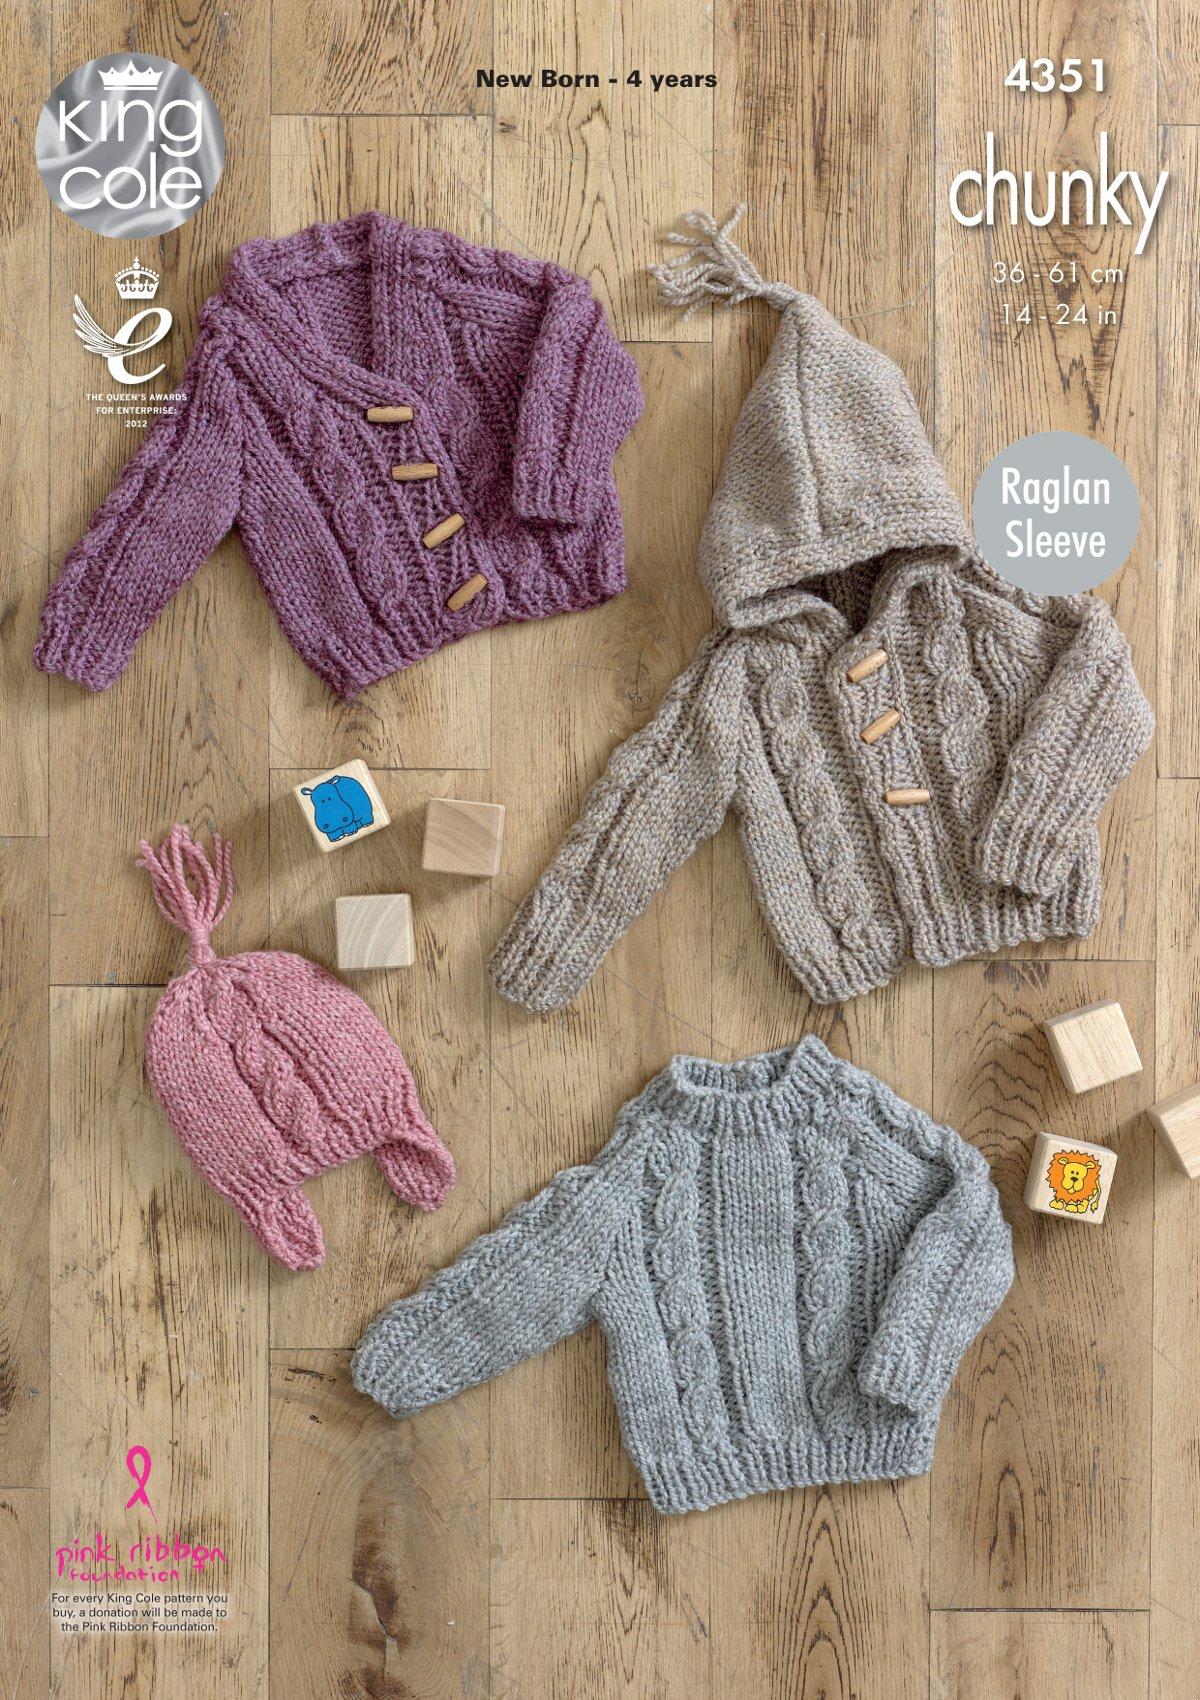 Raglan Sleeve Baby Cardigan Pattern | Sewing Patterns for Baby